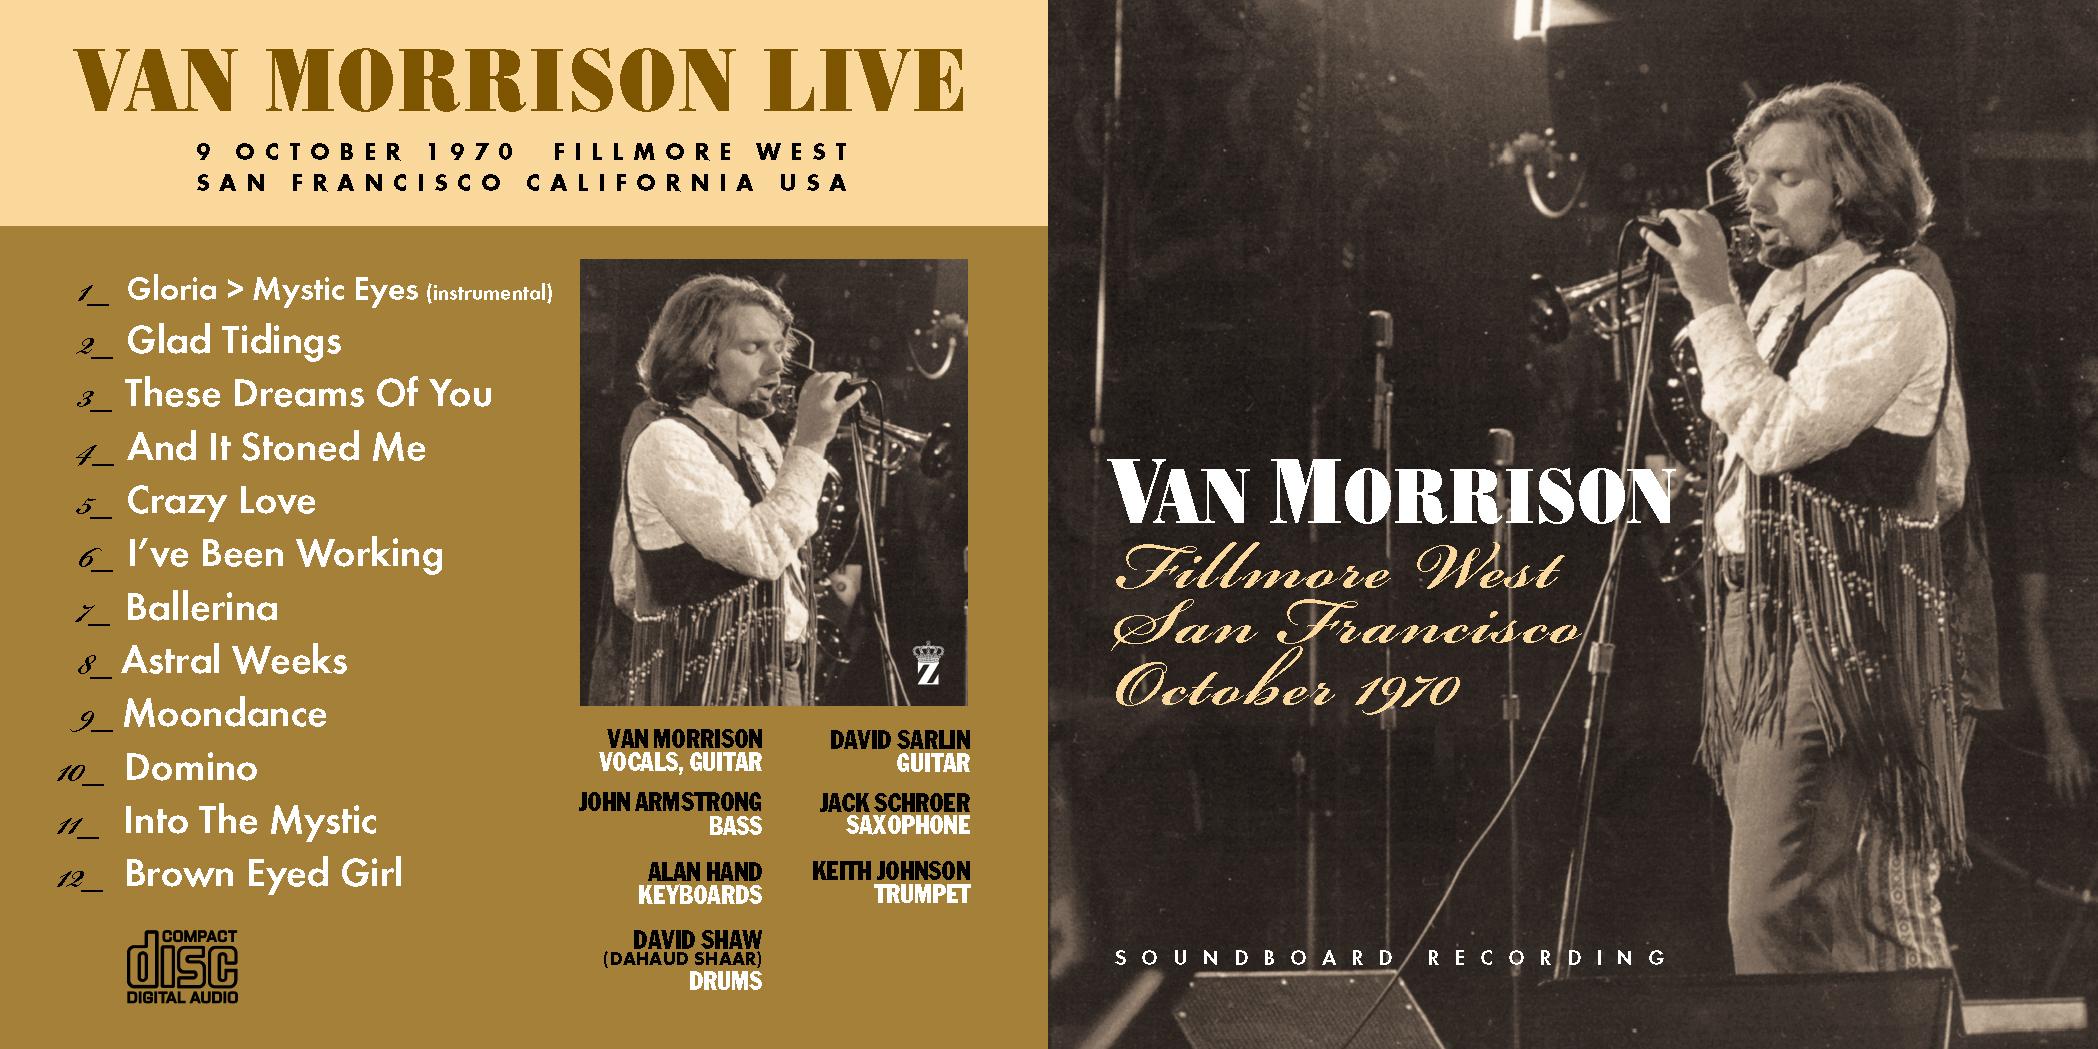 VanMorrison1970-10-09FillmoreWestSanFranciscoCA.jpg